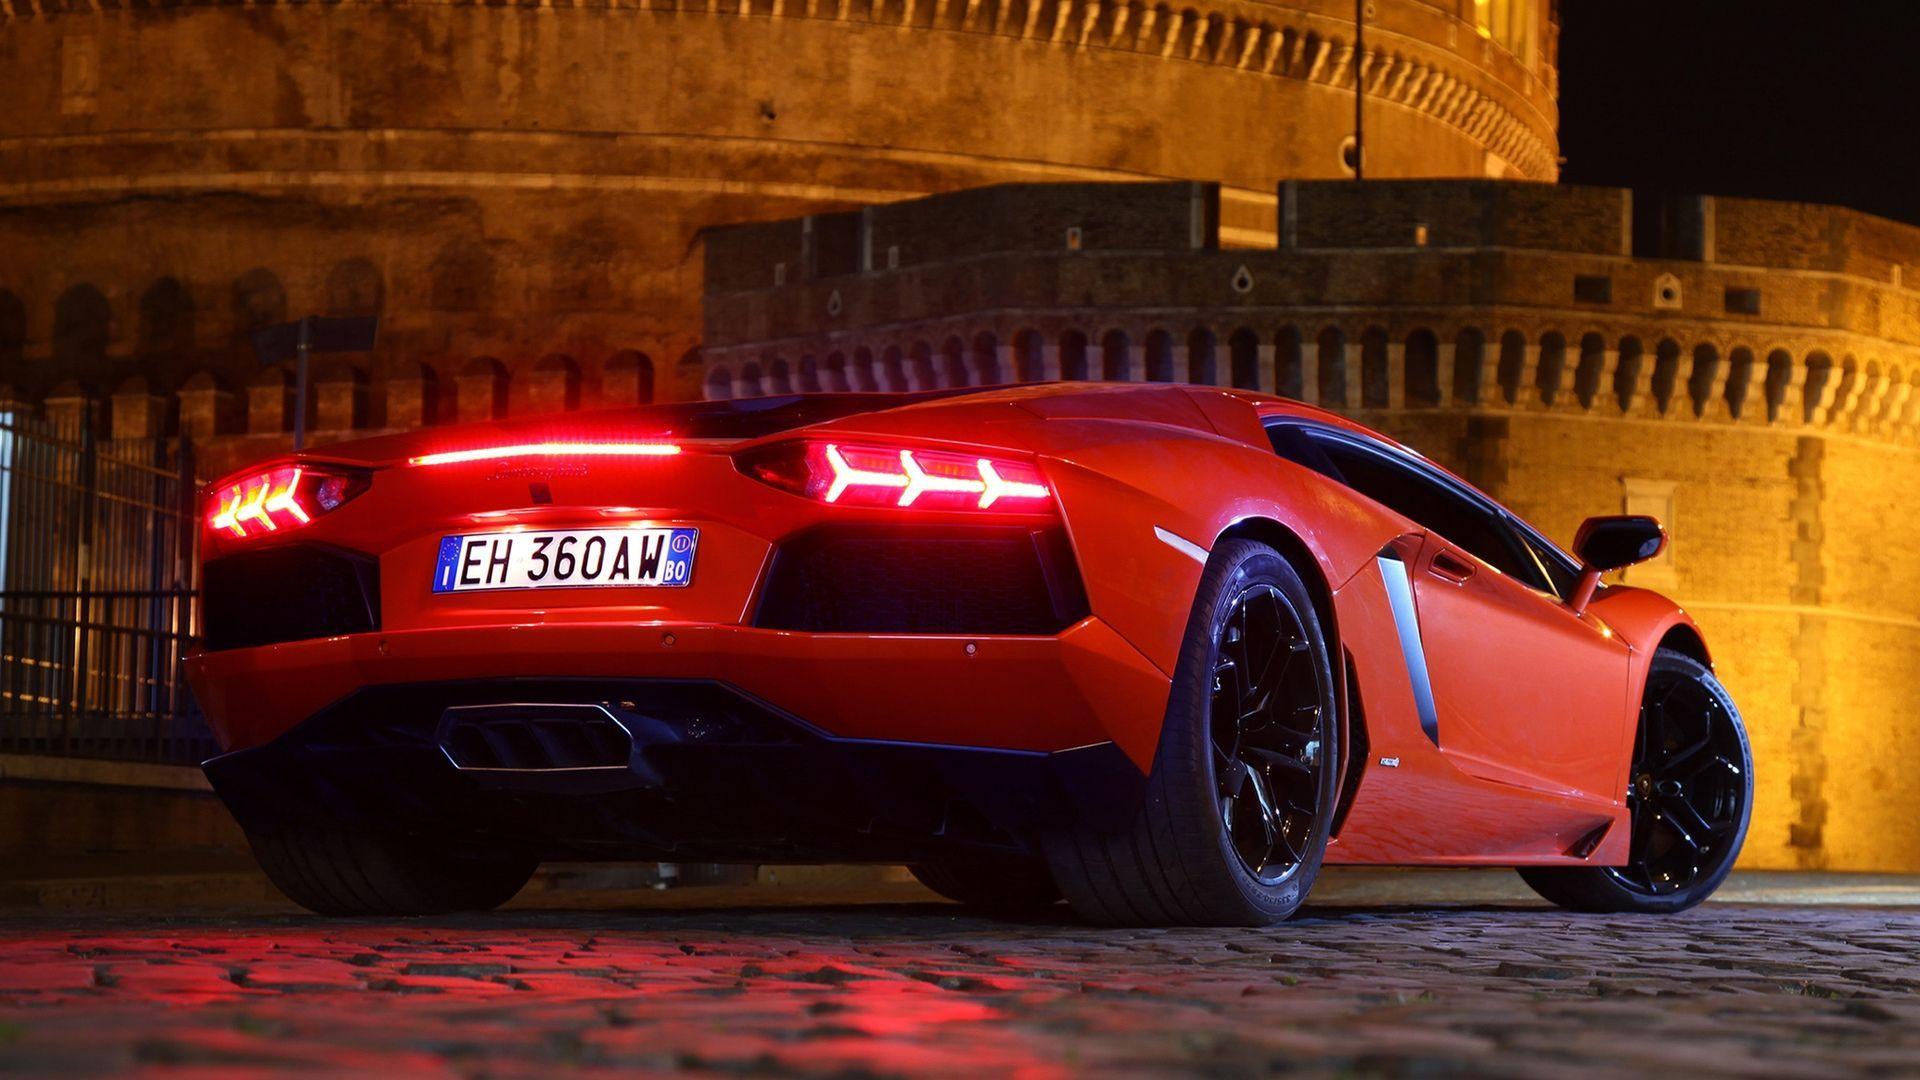 Close up of electric lamp against black background. Lamborghini Aventador Full Screen 1080p Black Car Wallpaper Hd